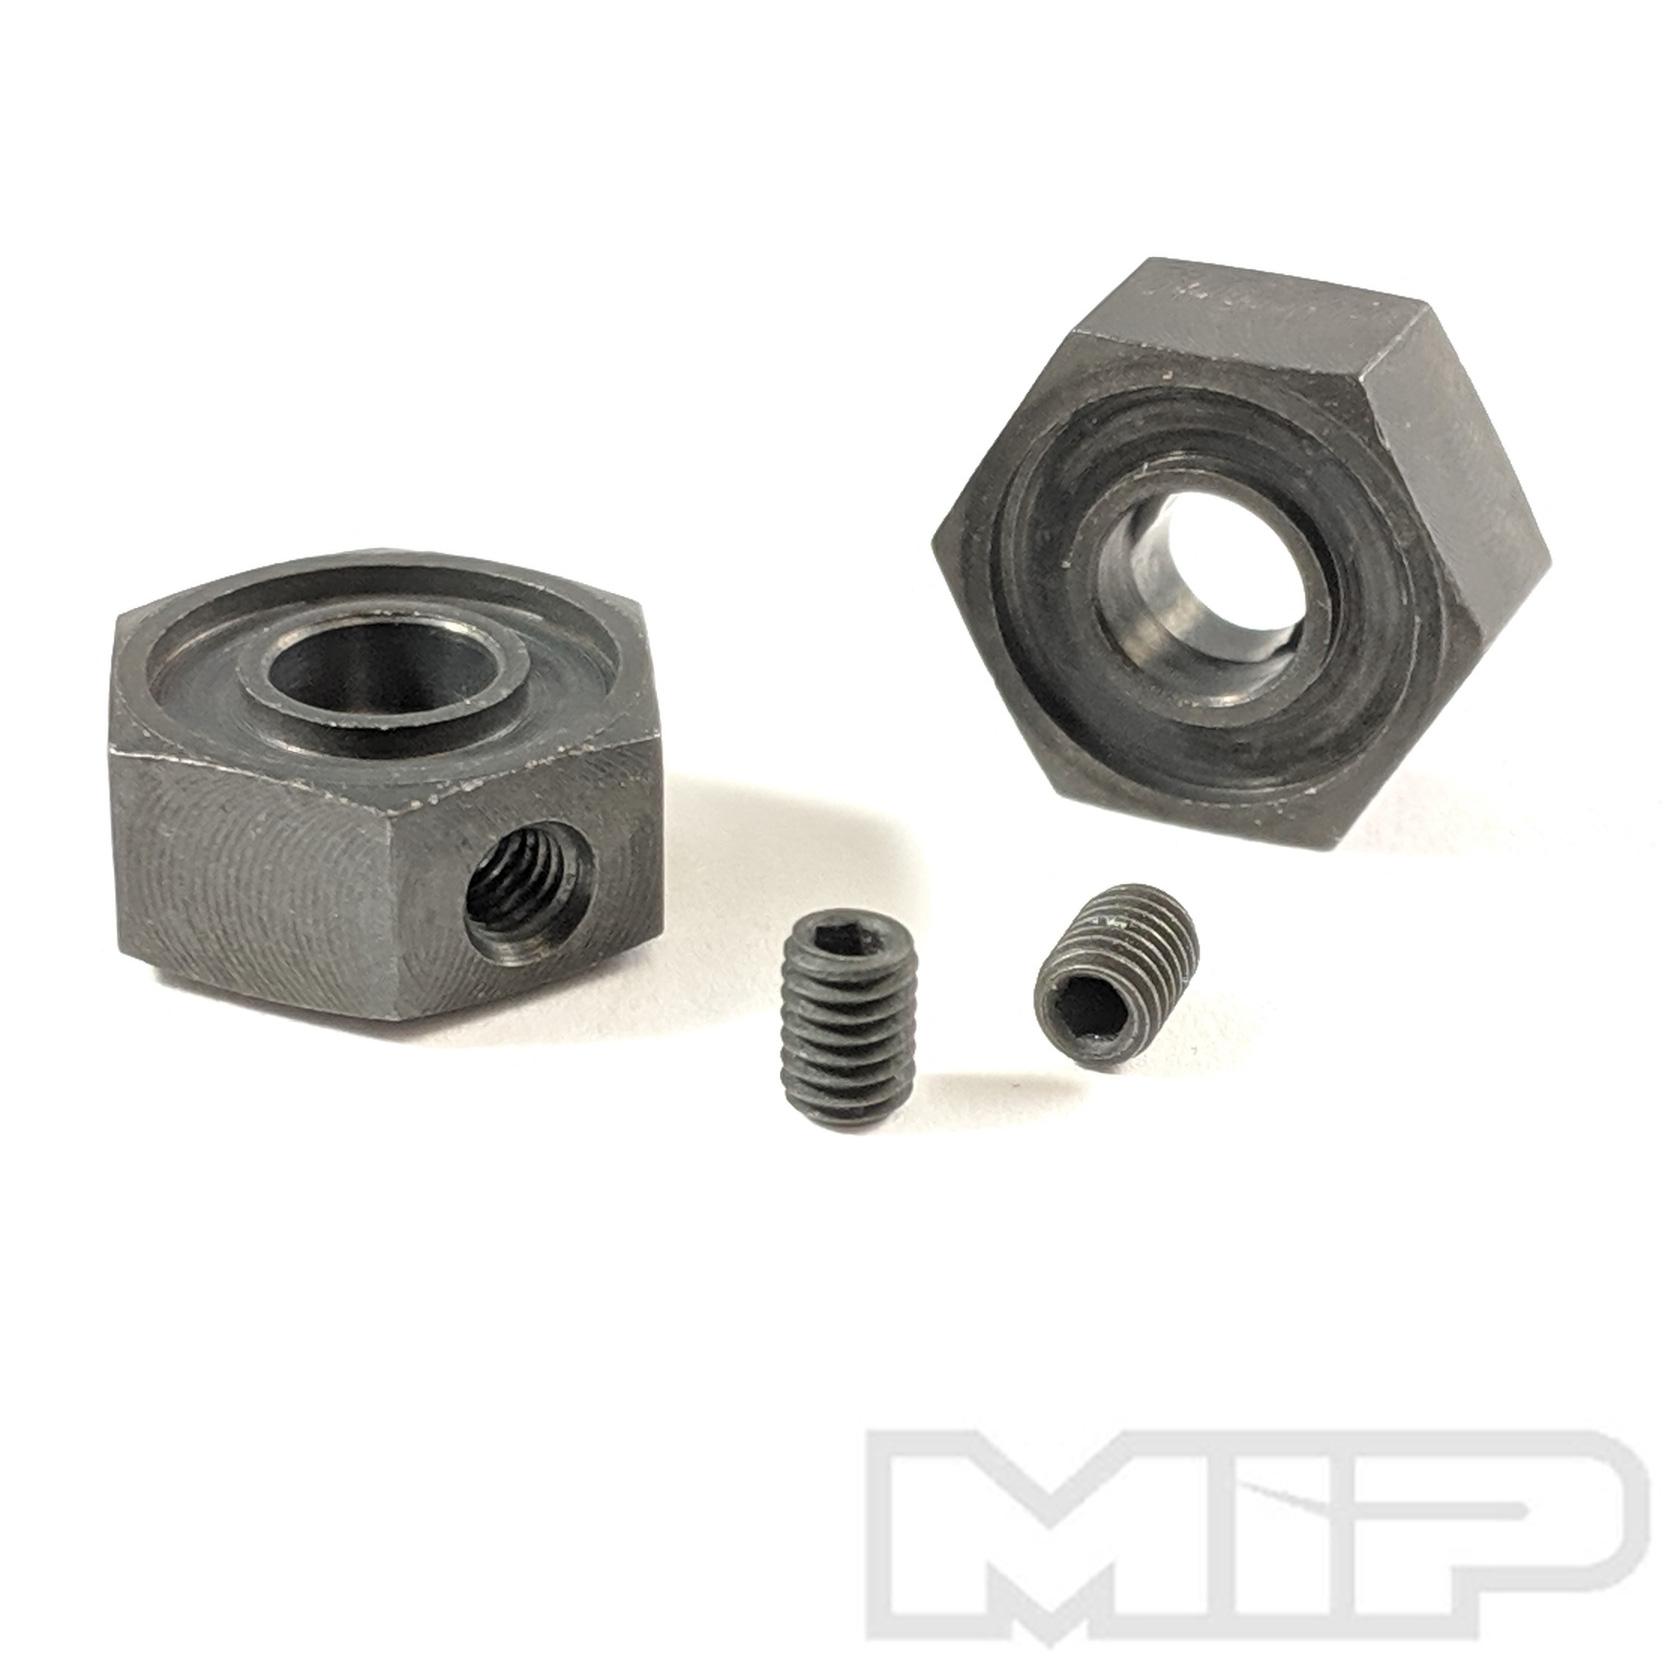 MIP12140 MIP 12mm X-DUTY Keyed CVD Hex Adapter Set 2